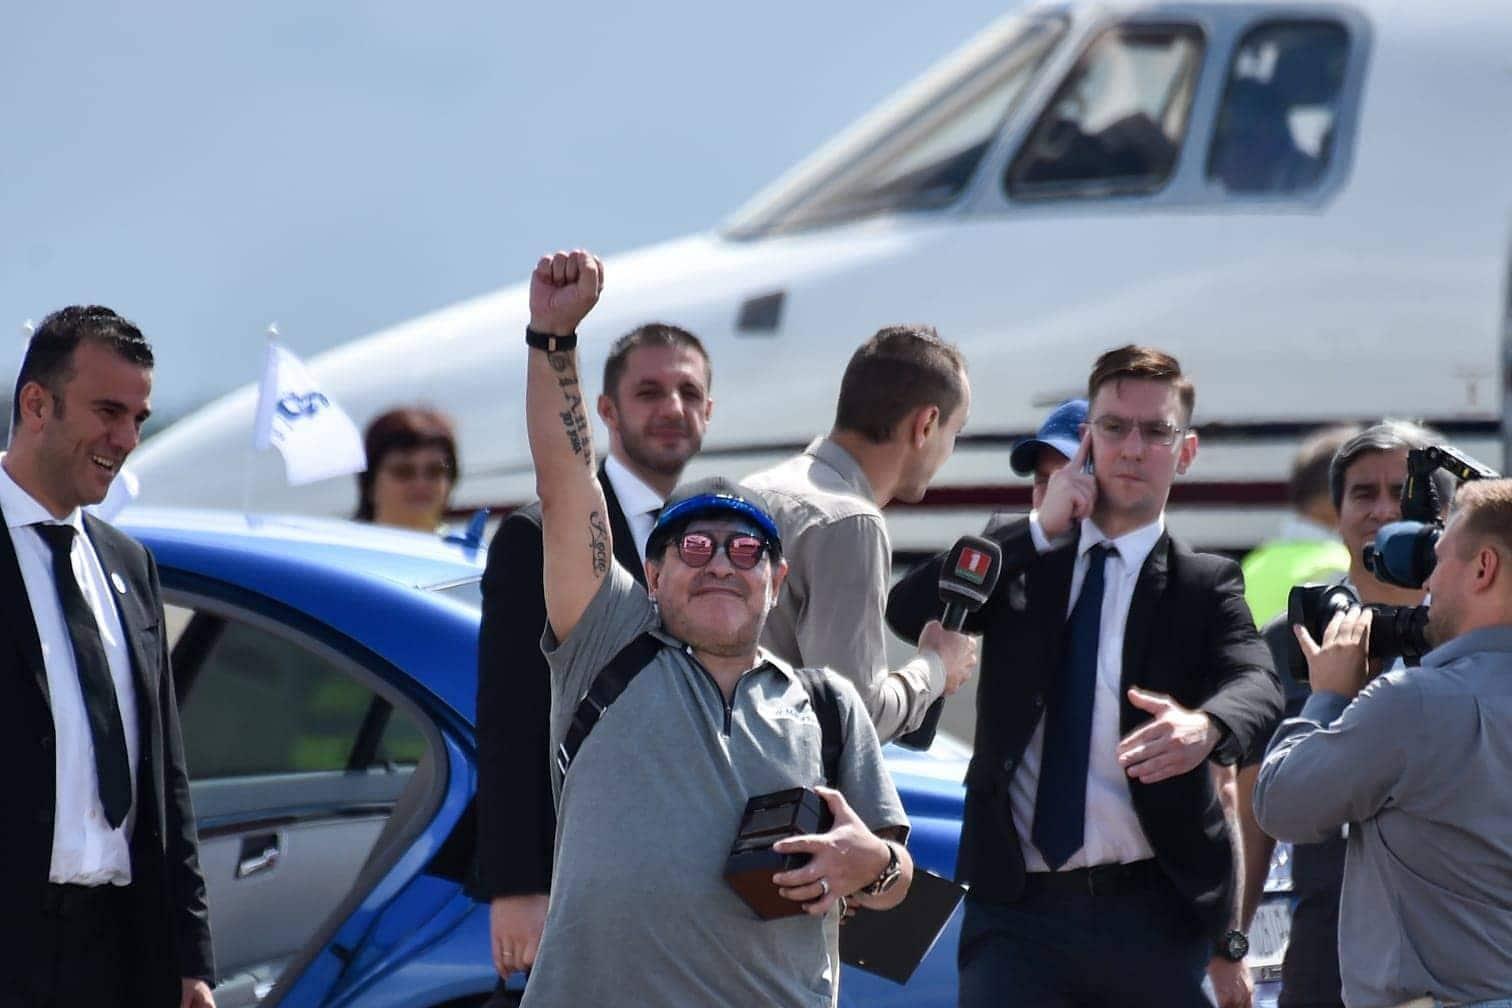 <p>War wohl alles gut. Maradona reckt die Faust in die Höhe.</p> Foto: AFP